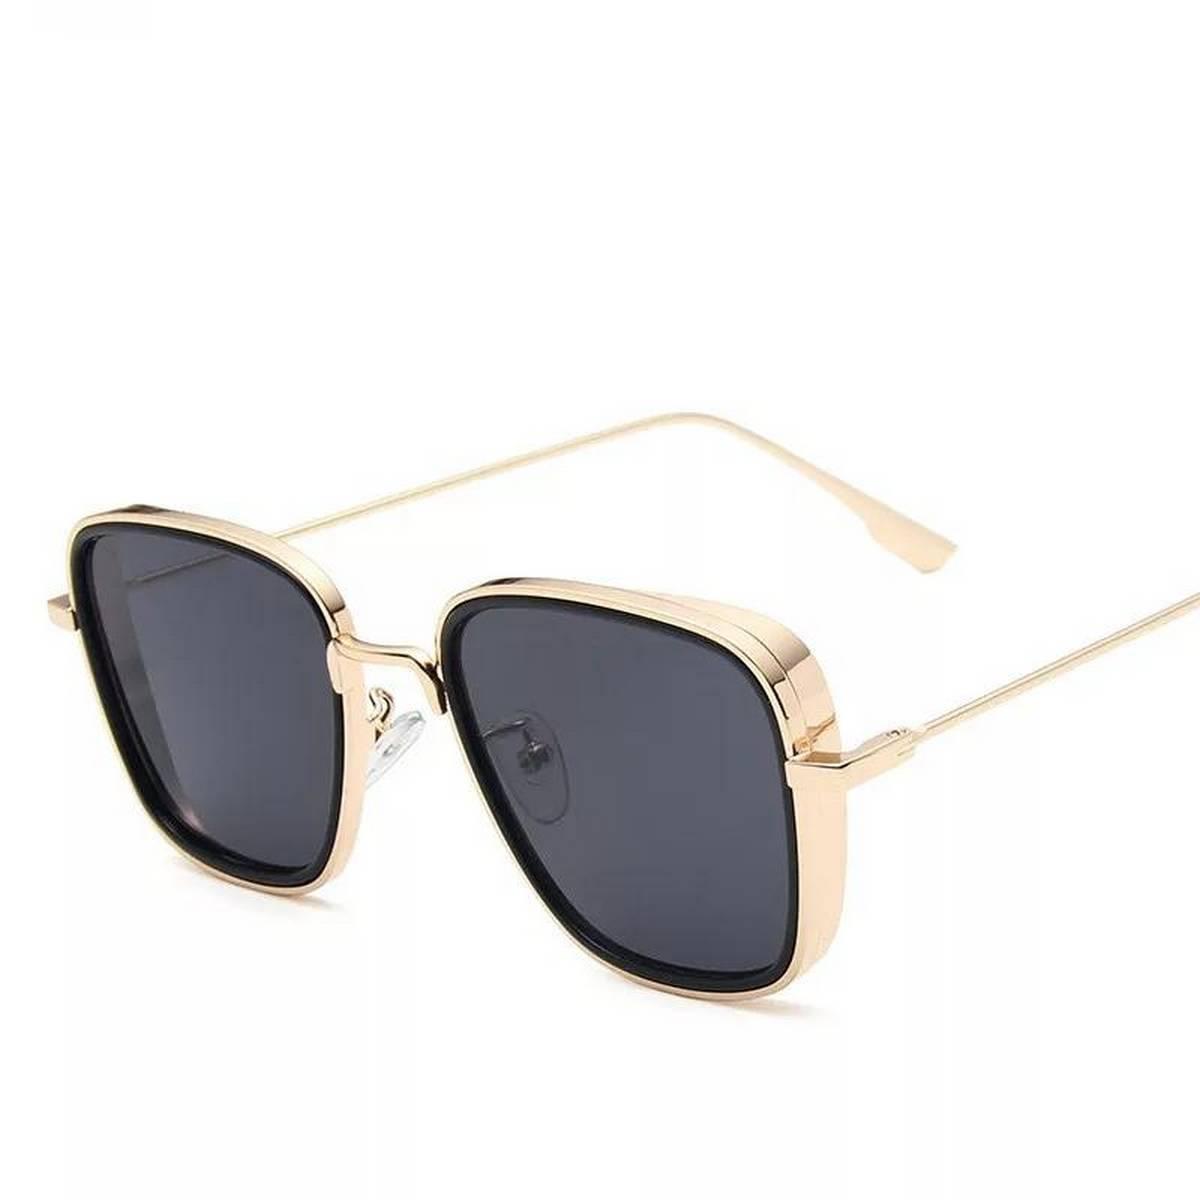 New Kabir Singh India Movie Sunglasses Men Square Retro Cool Sun Shades Steampunk Style Sun Glasses for Men